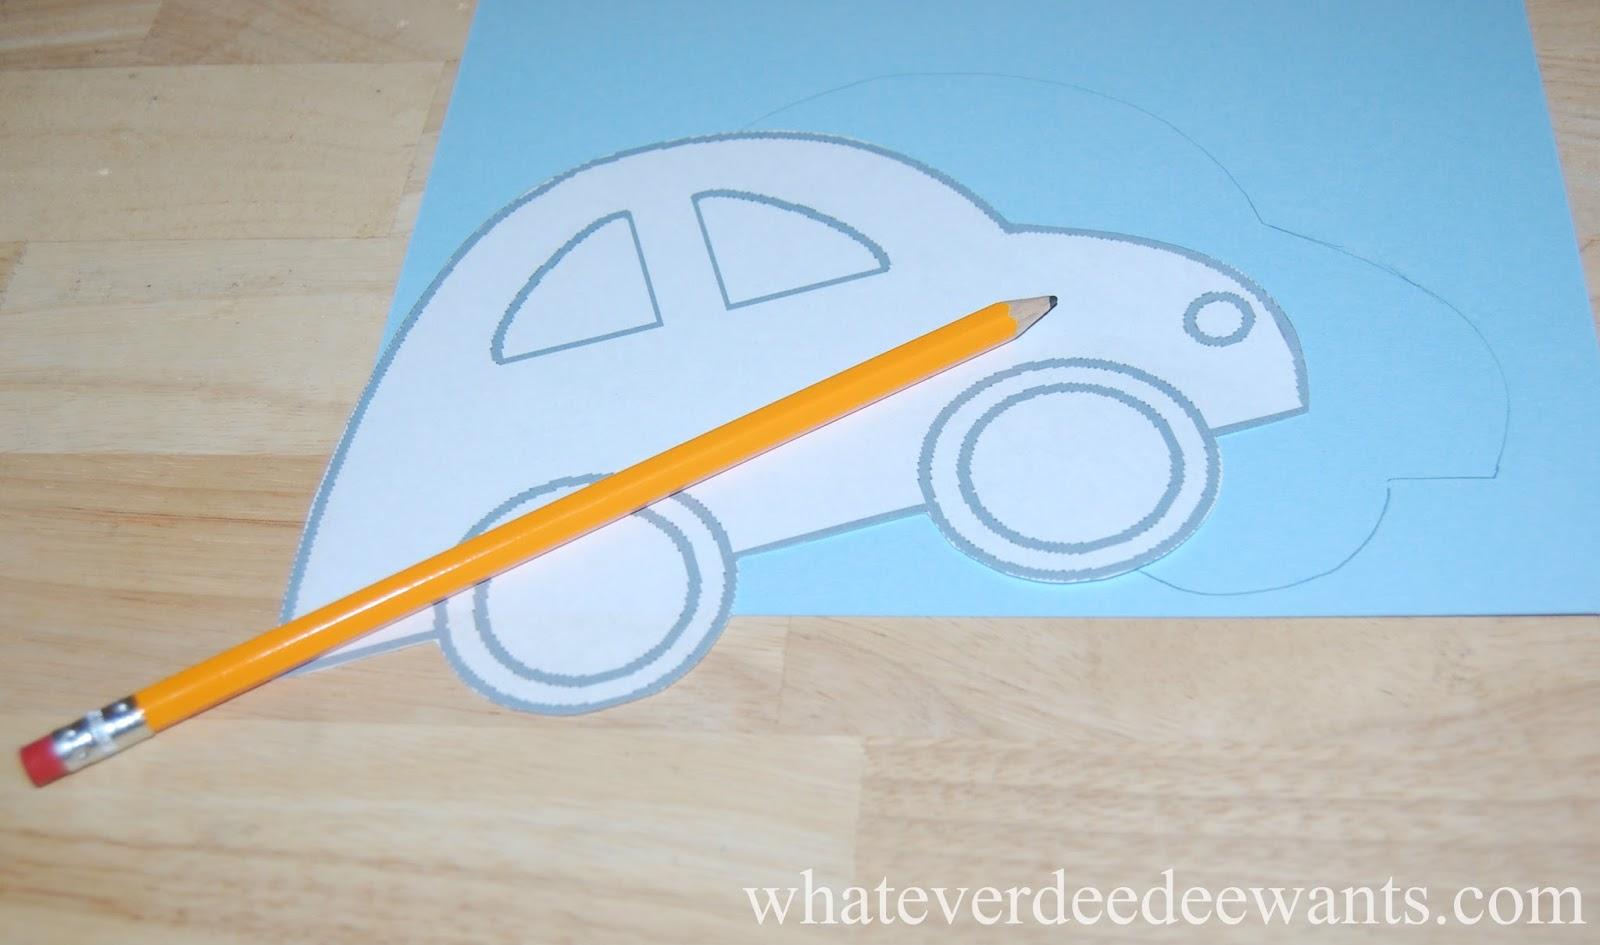 Whatever Dee-Dee wants, she's gonna get it: DIY Kids Sewing Card